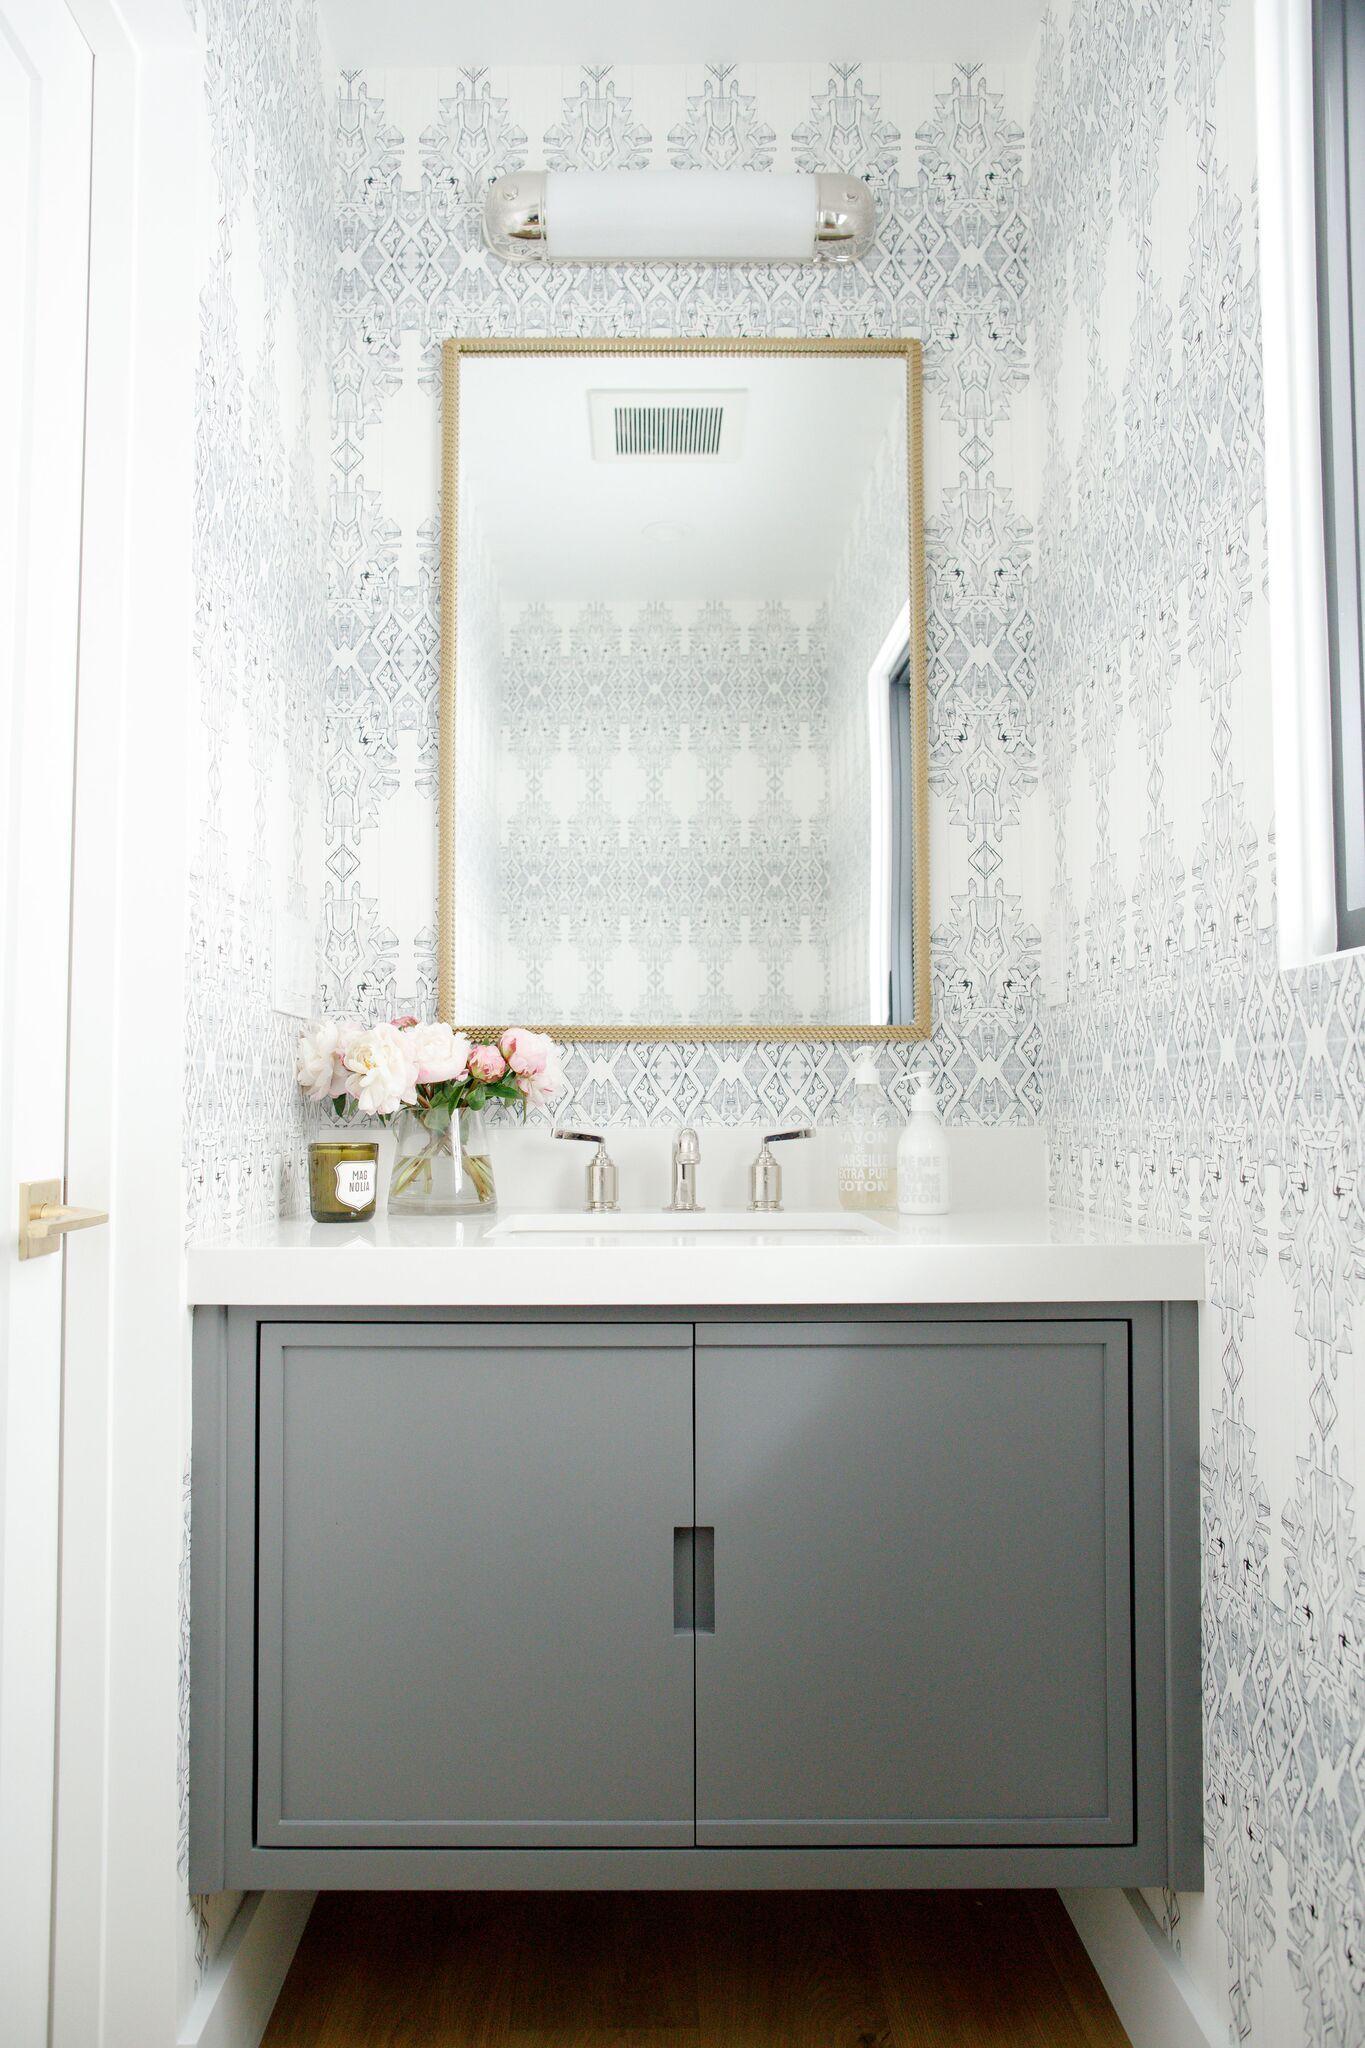 Rangeview Reno Pt.2: Kitchen + Bathrooms | Studio mcgee, Powder room ...